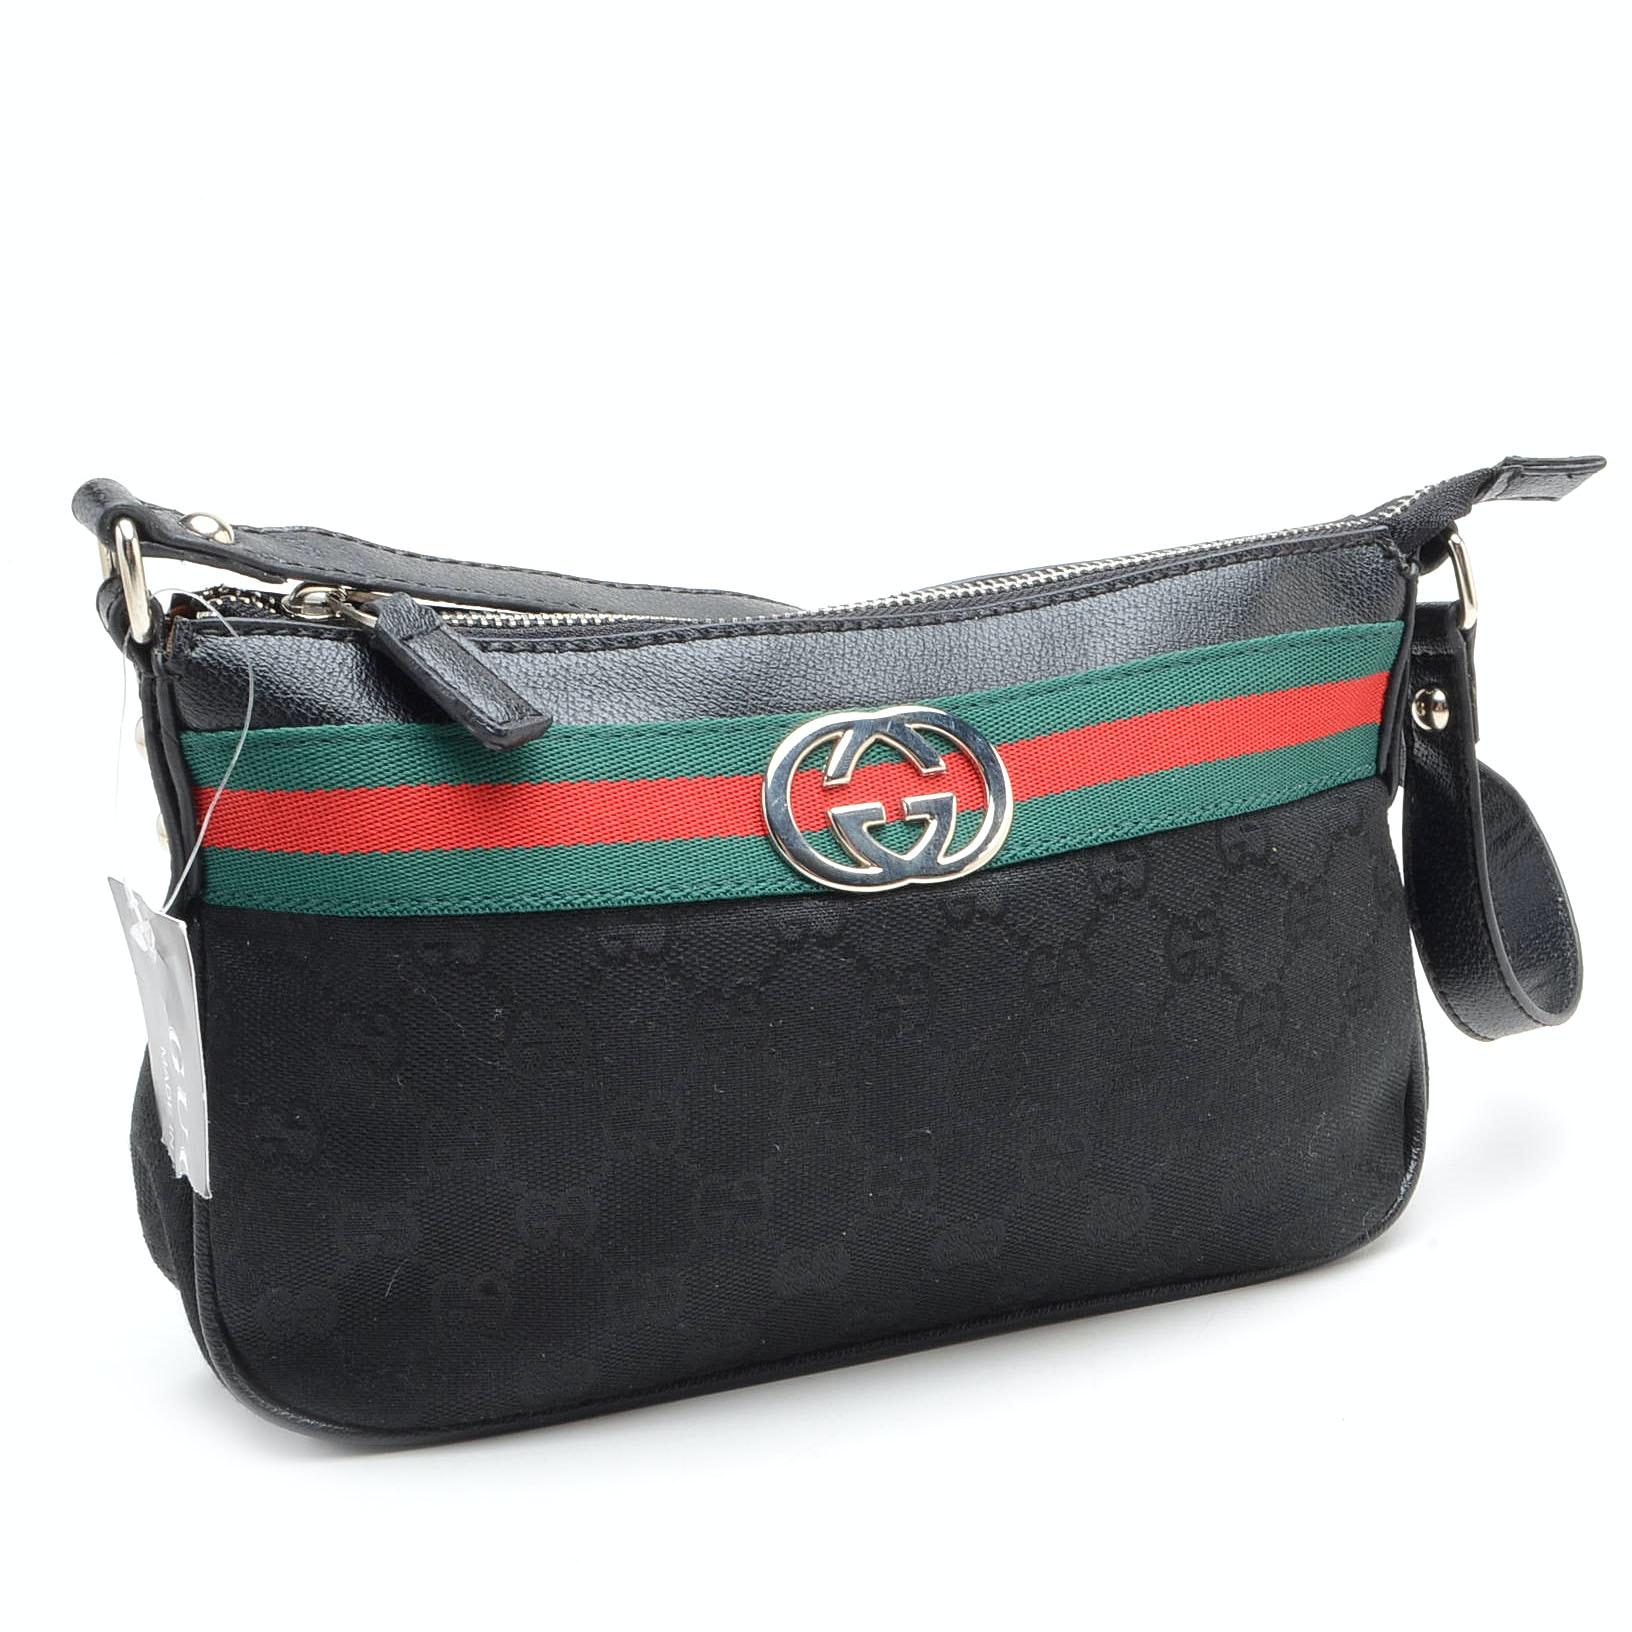 Gucci Logo Canvas Striped Handbag